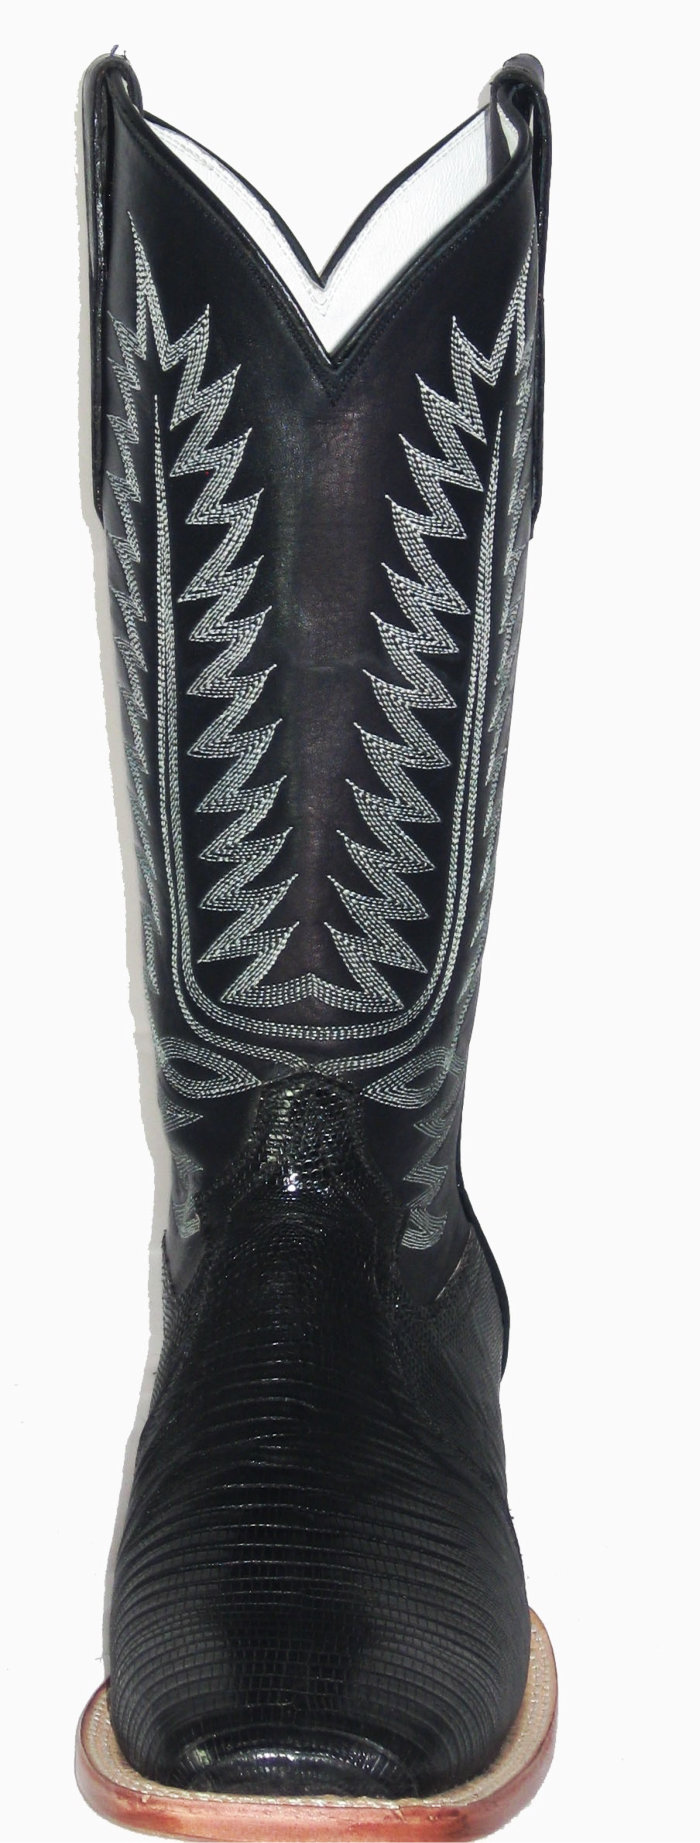 7a08b99efb8 Black Lizard Square Toe Height 13